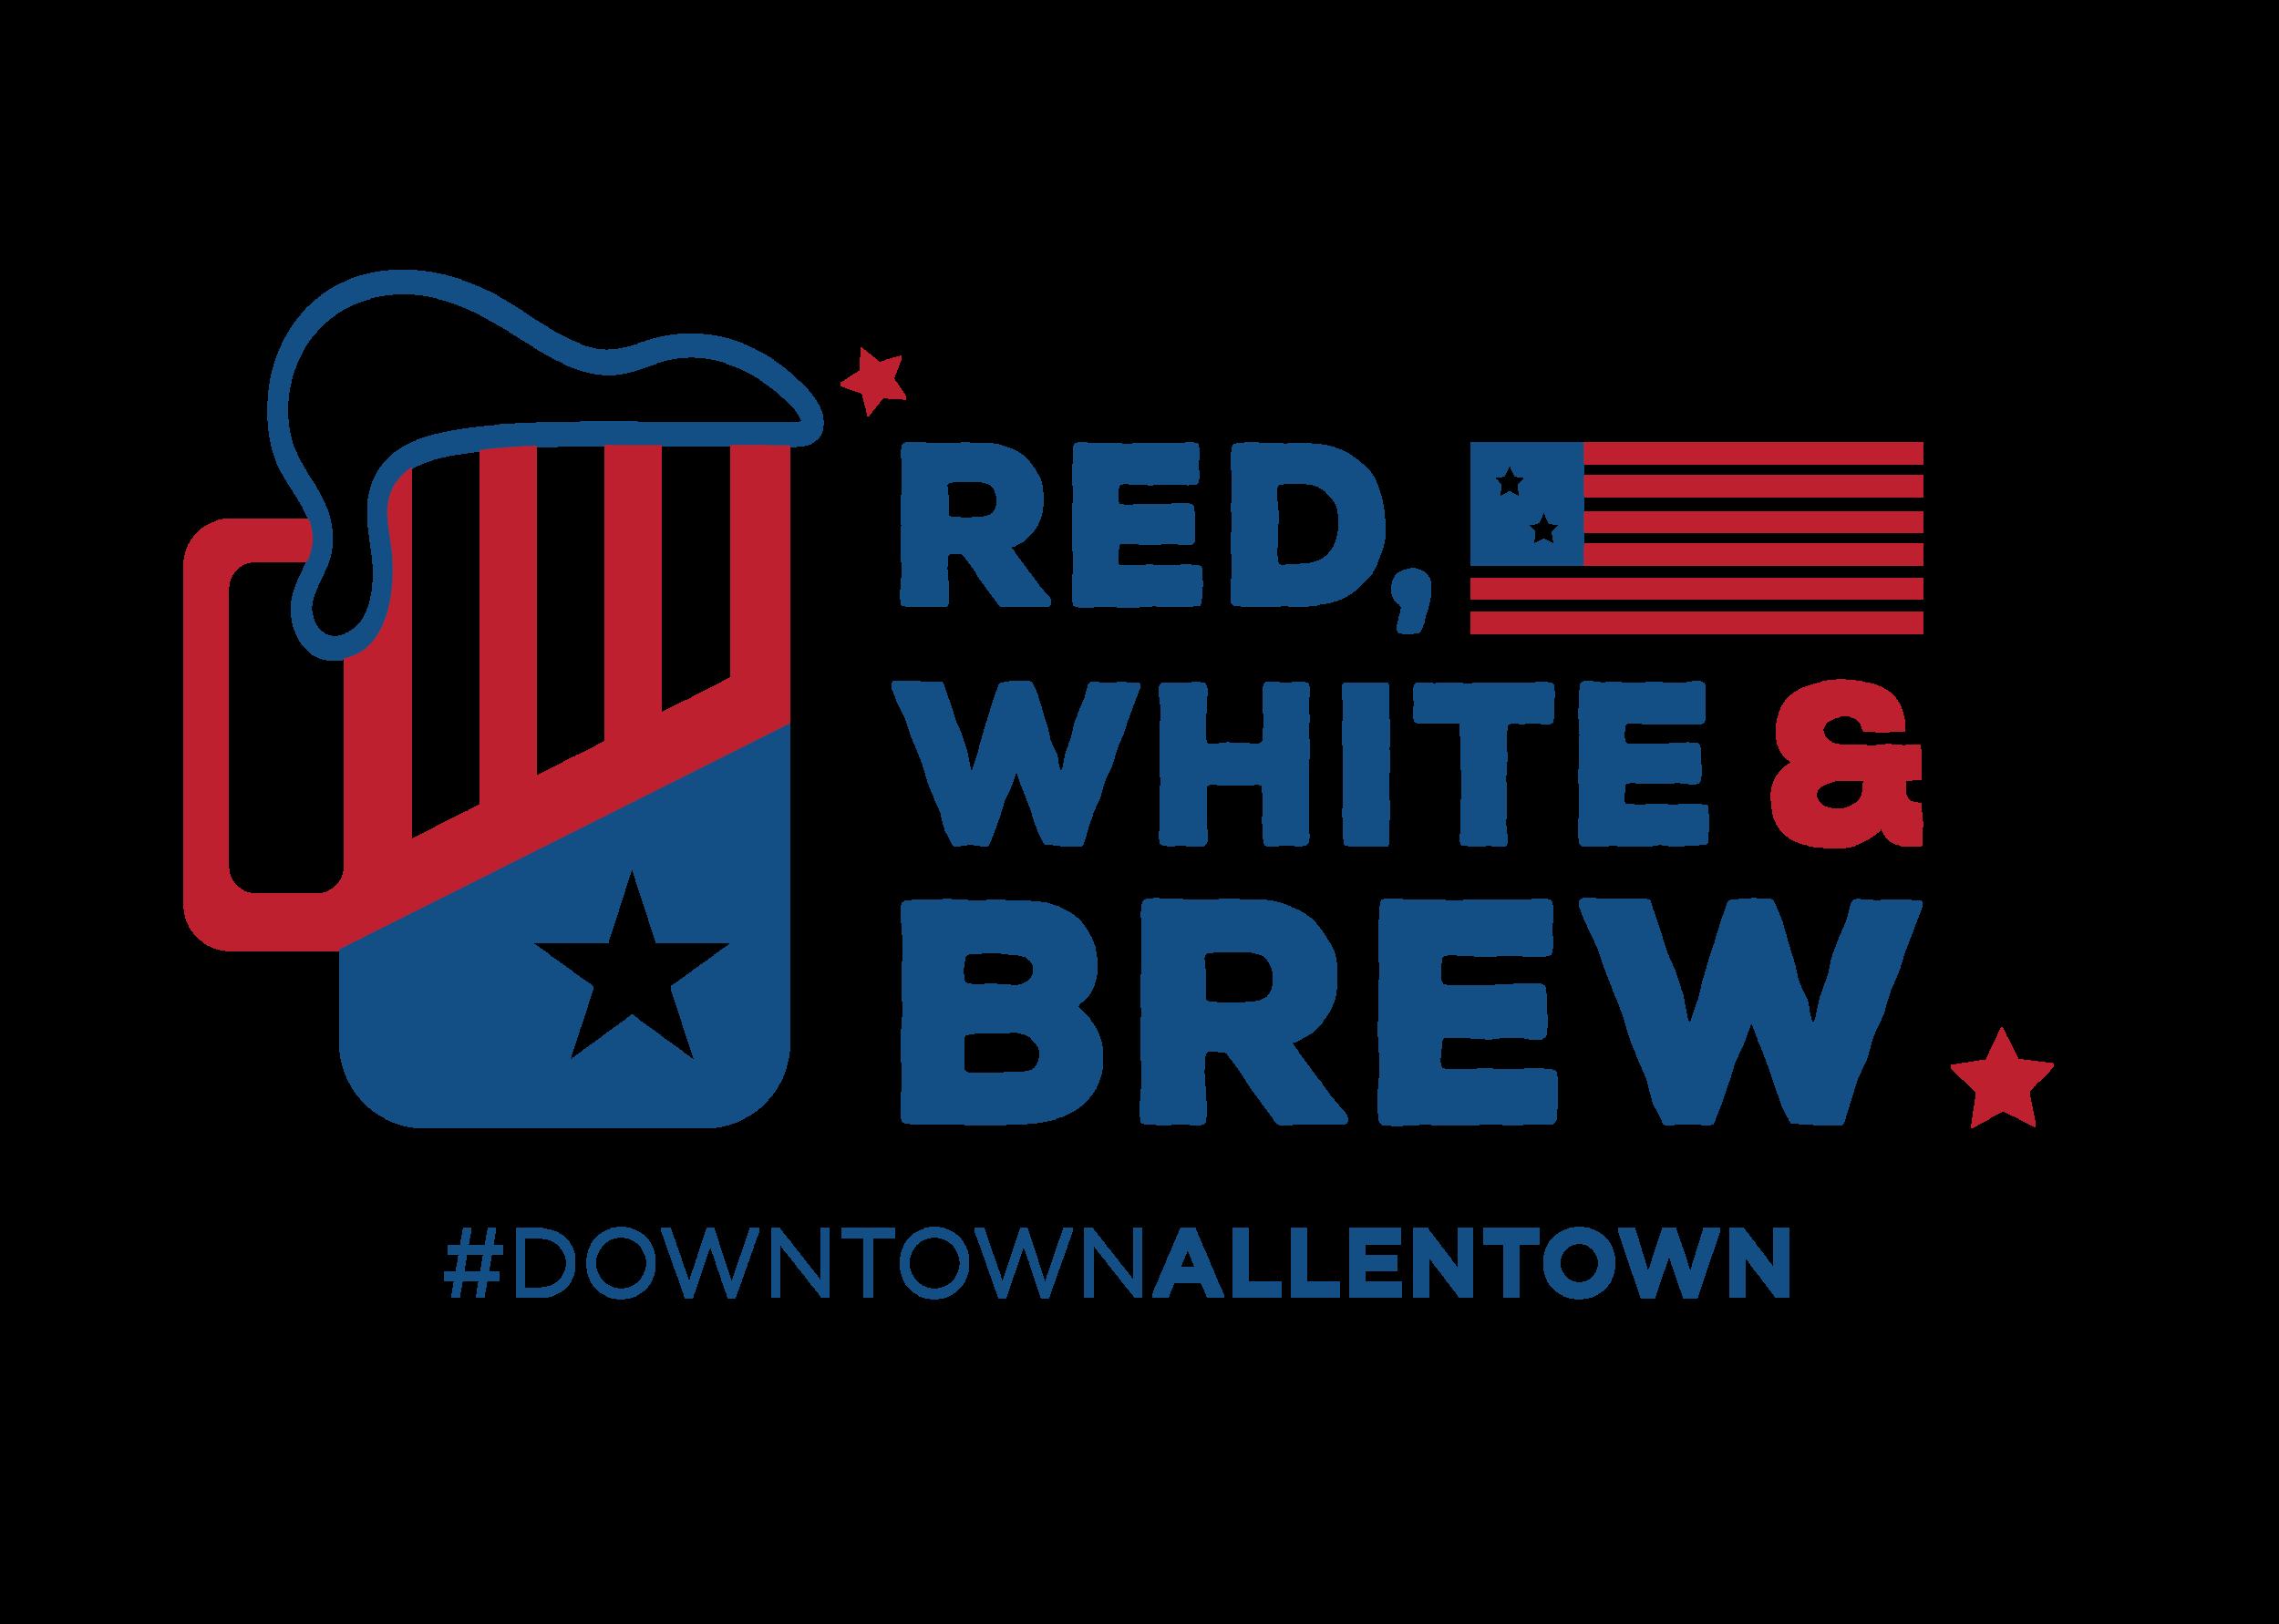 redwhitebrew-logo-2clr-11.png